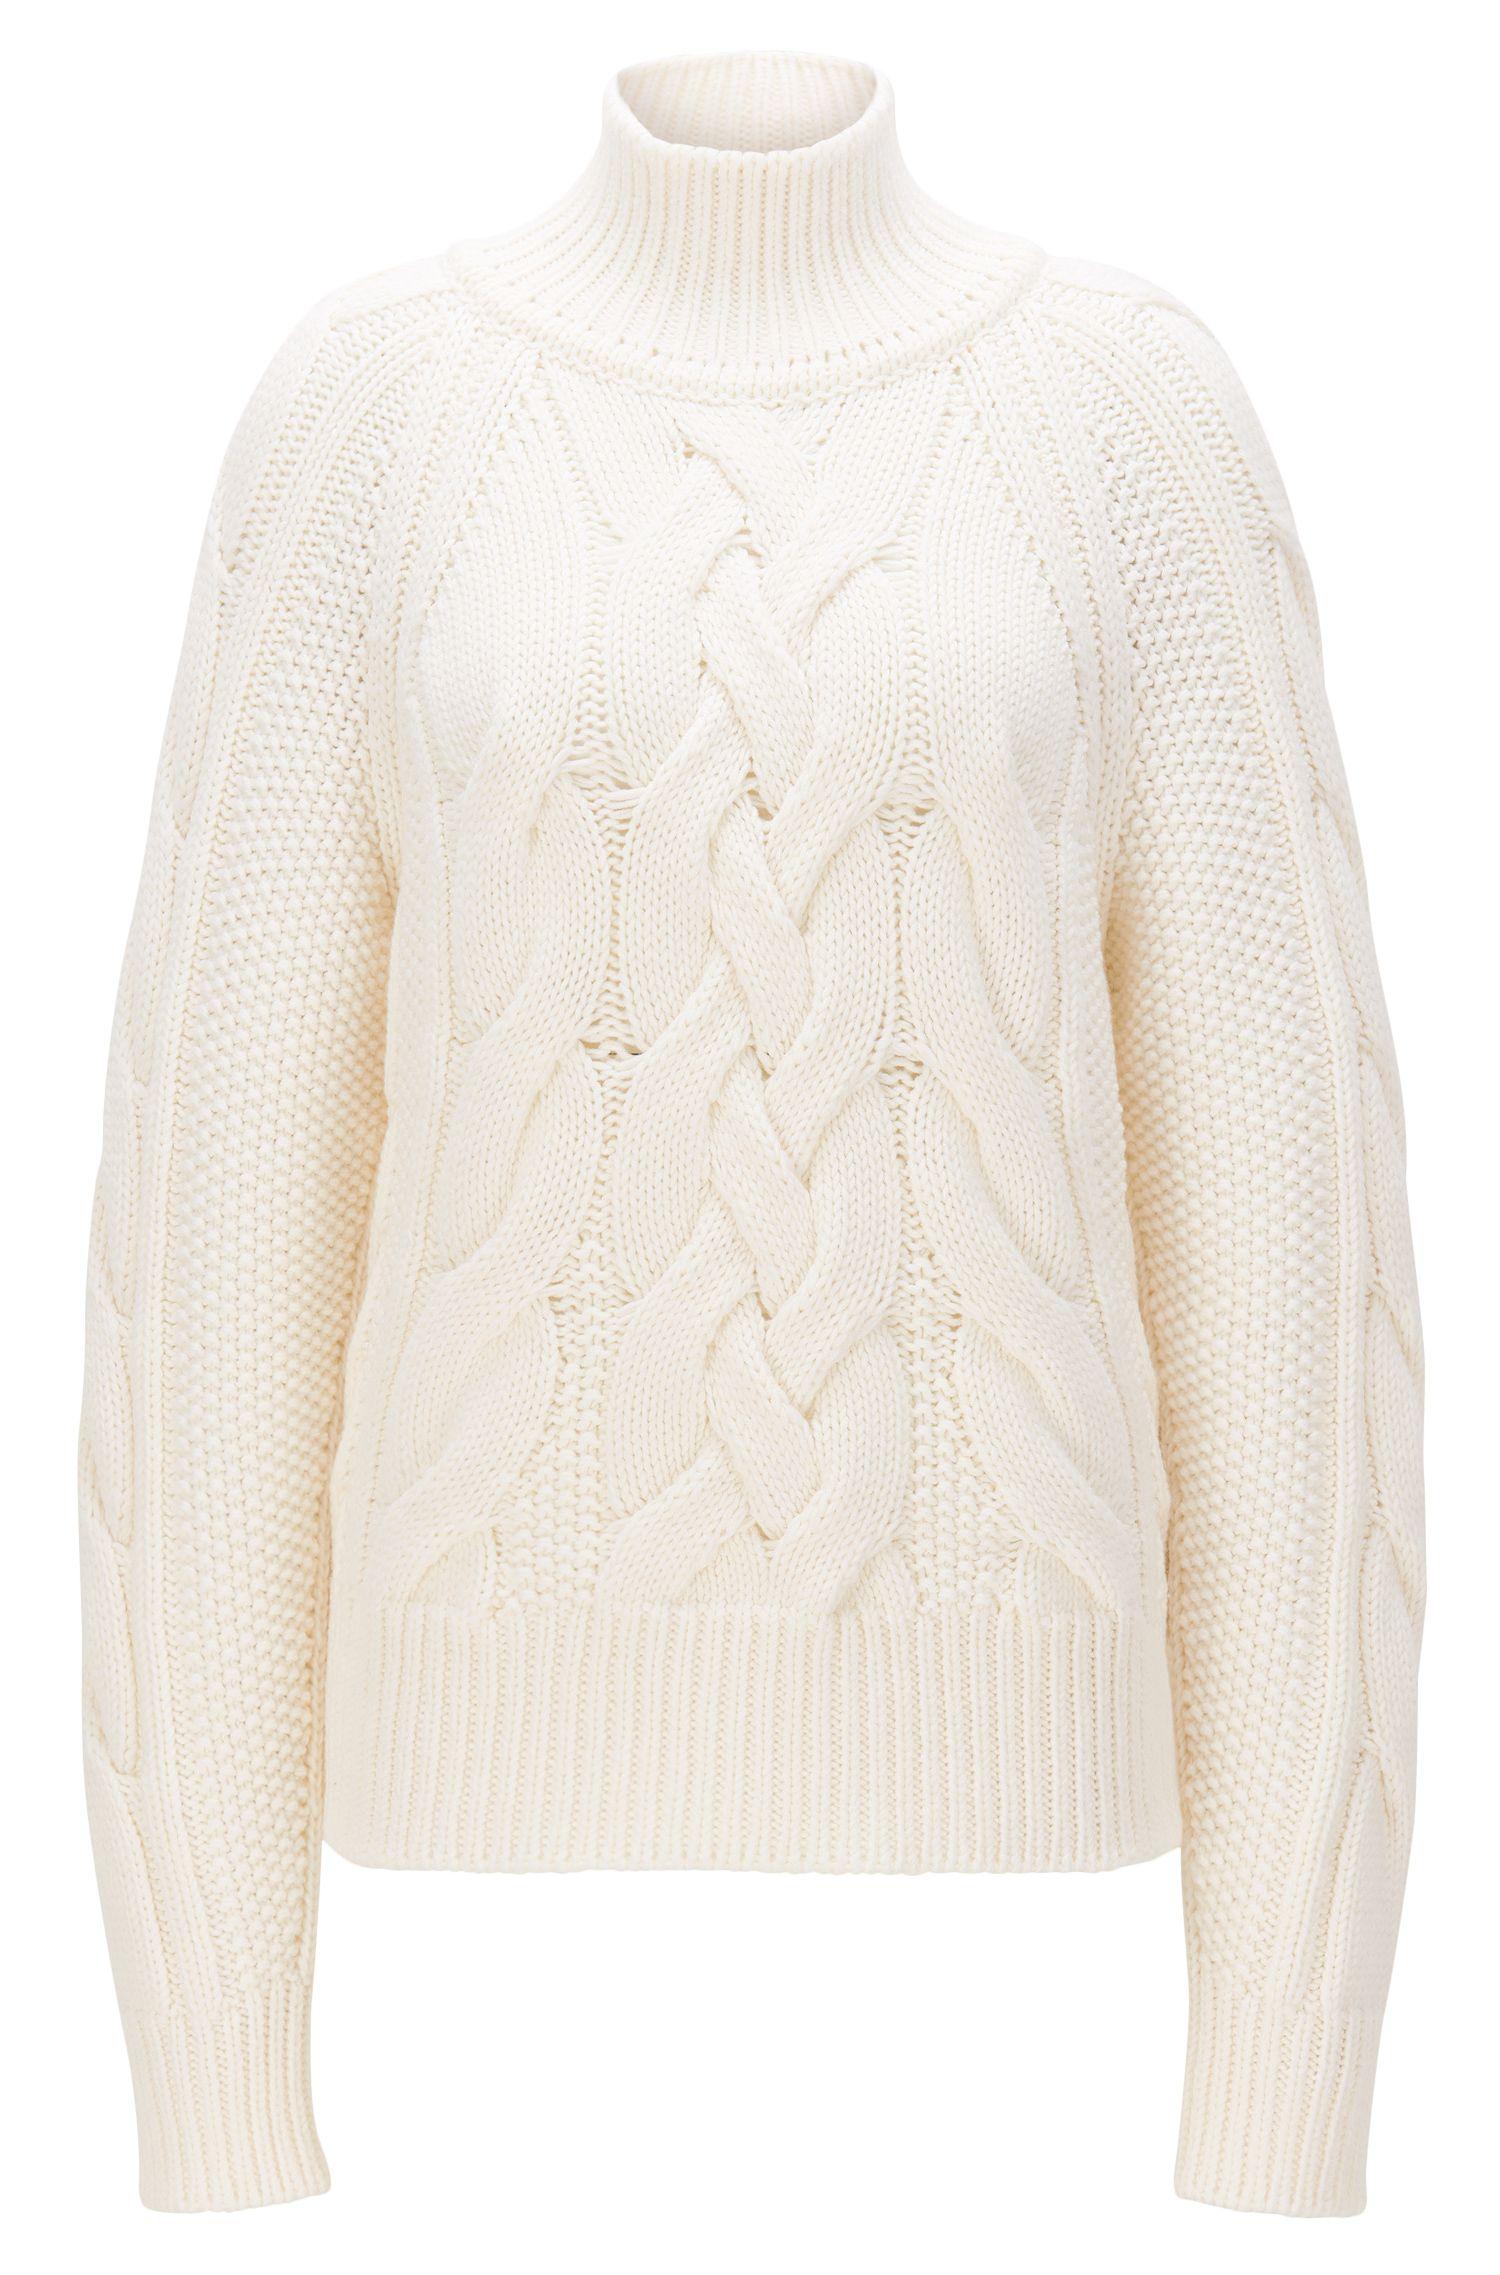 Gebreide trui van scheerwol met kabelpatroon